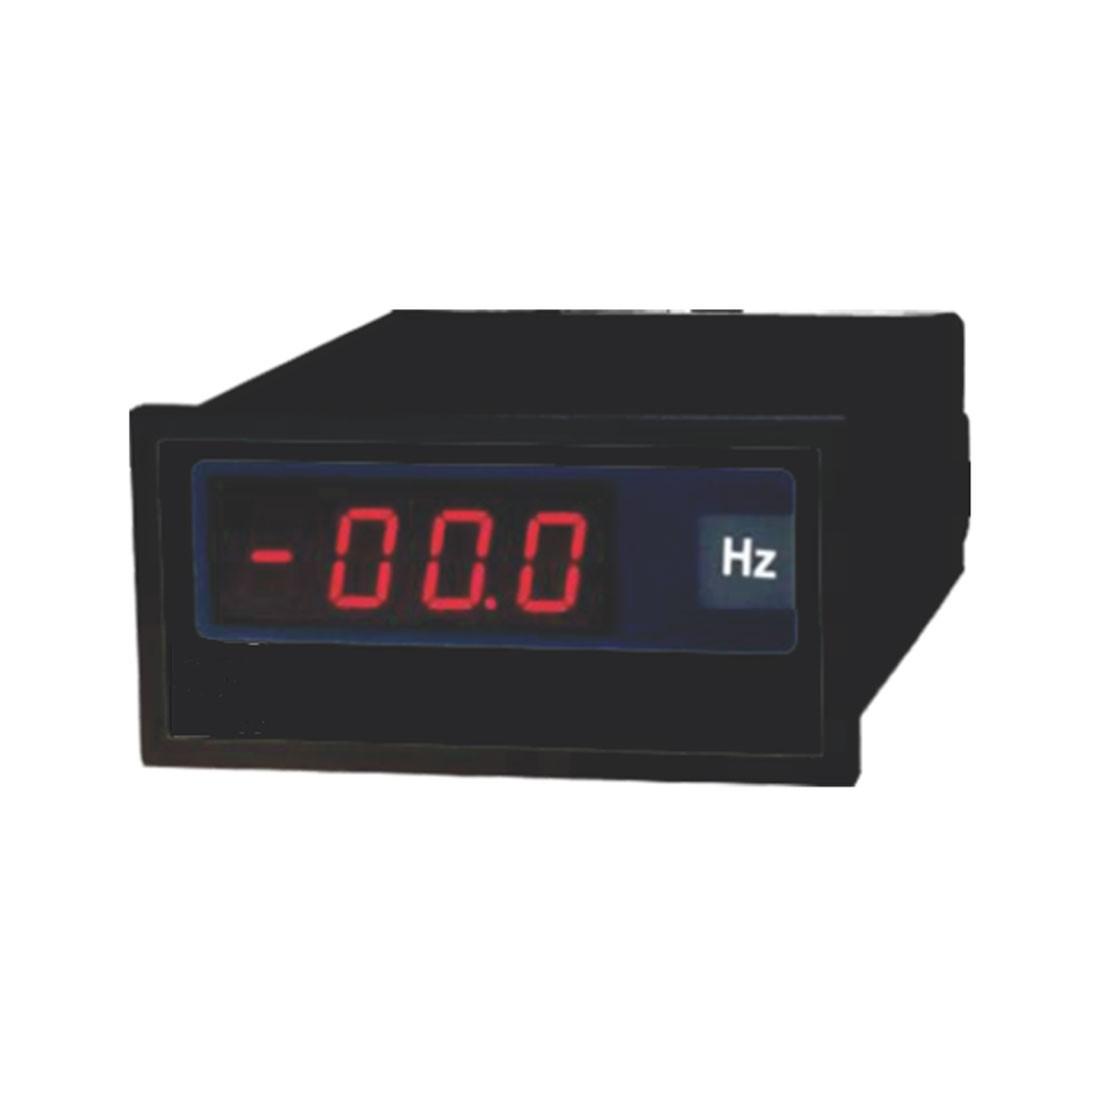 Beta Hz Digital Frequency Meter